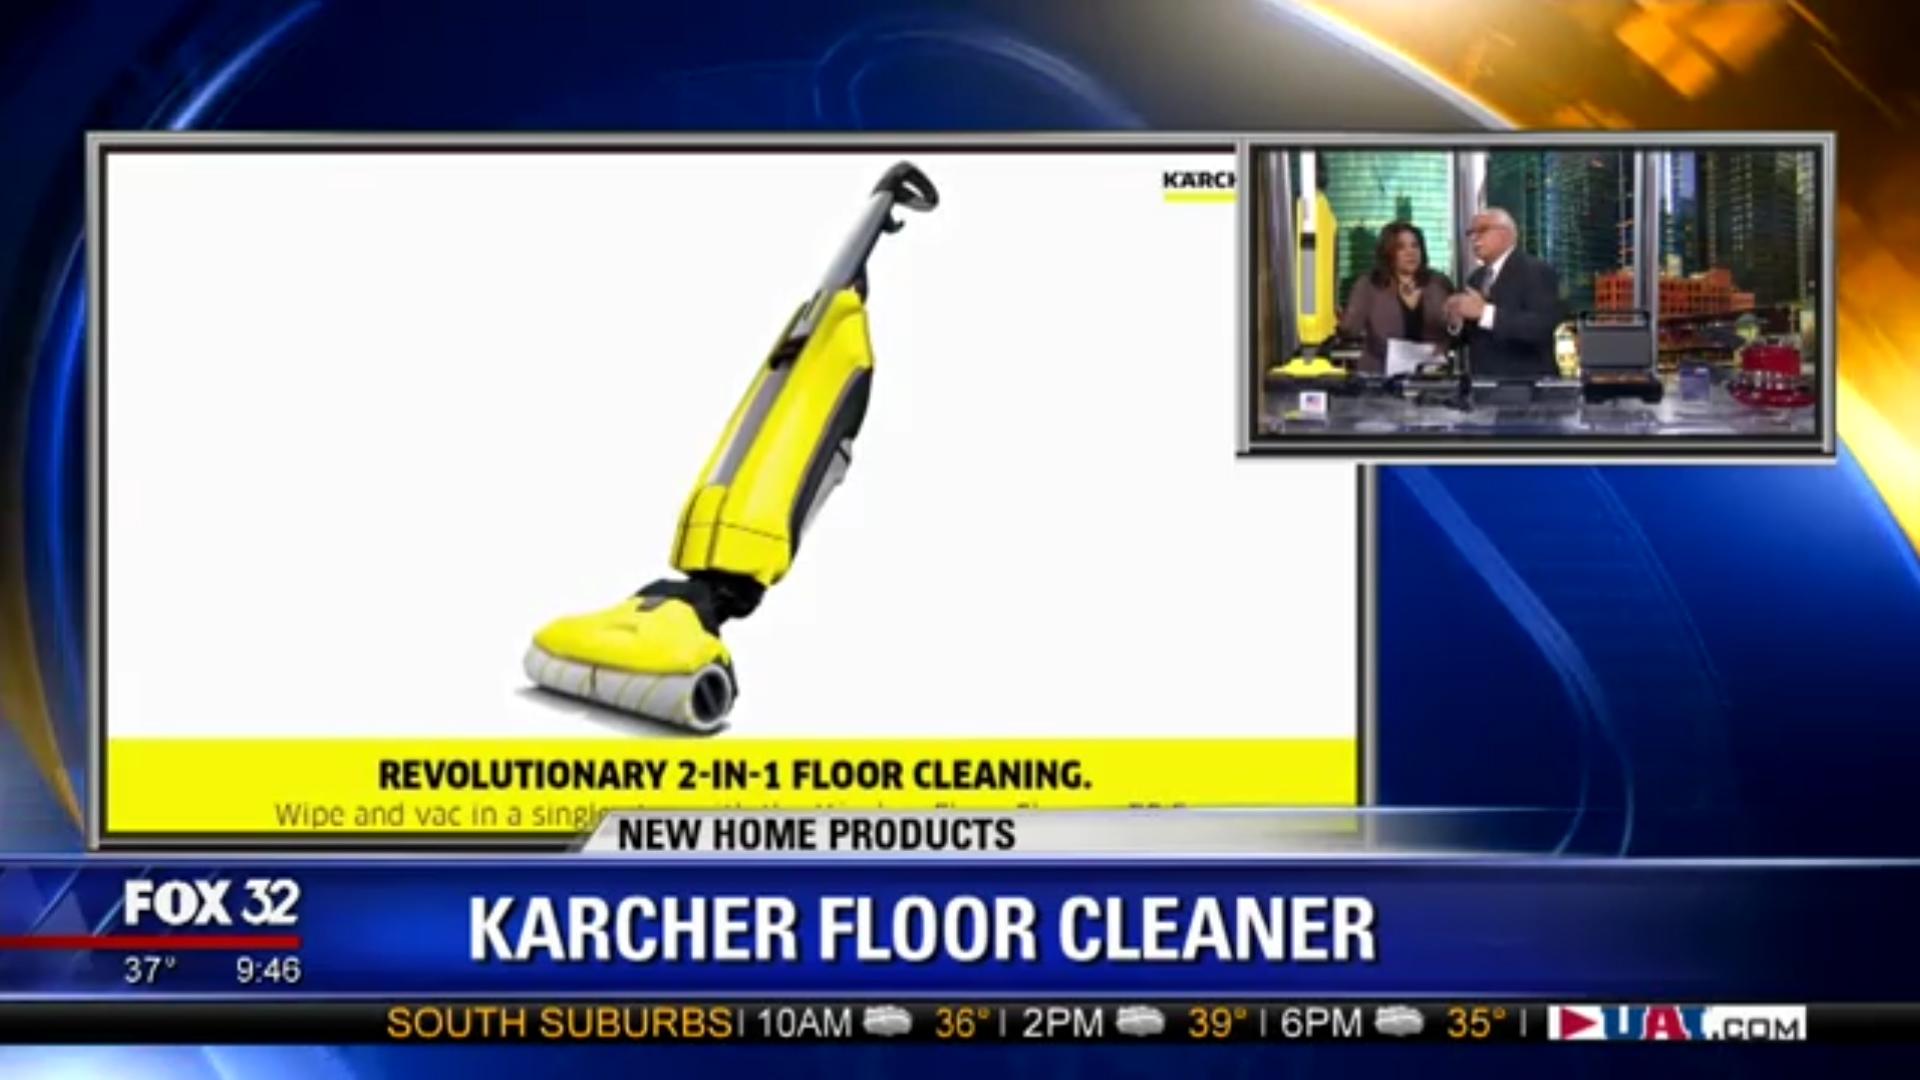 KARCHER FC5 FLOOR CLEANER  - $299.00Shop Now